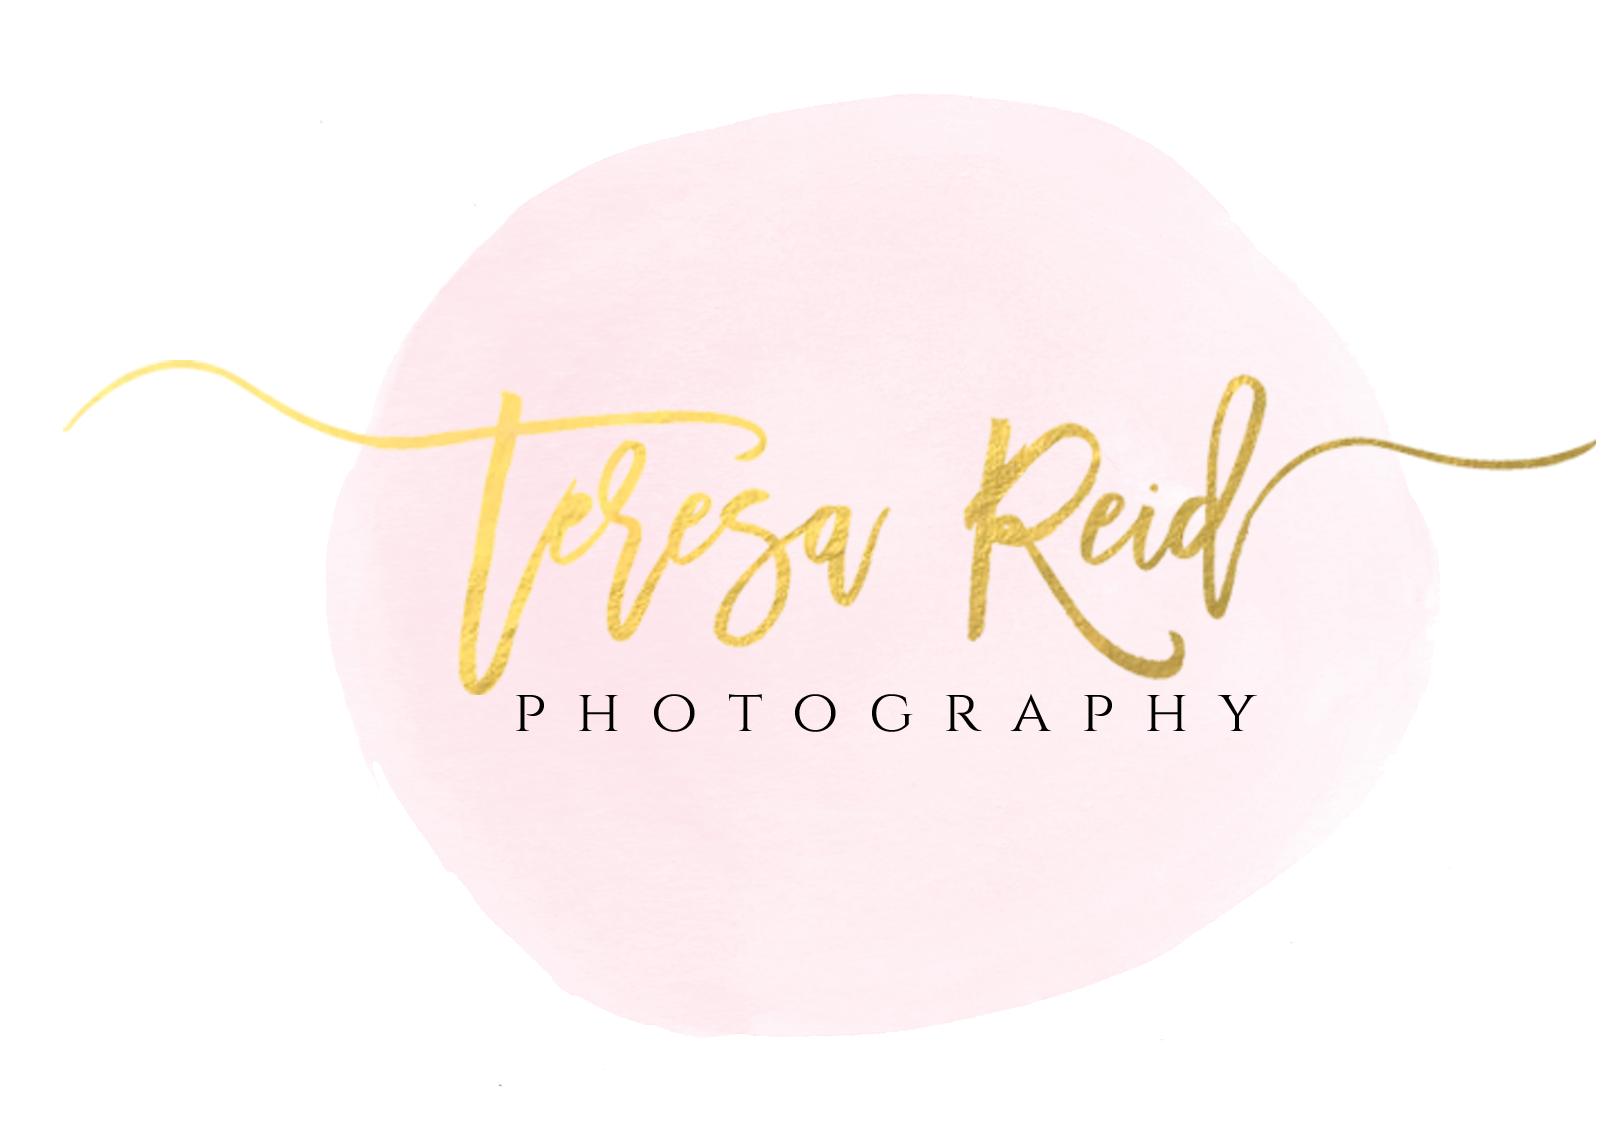 Teresa Reid Photography